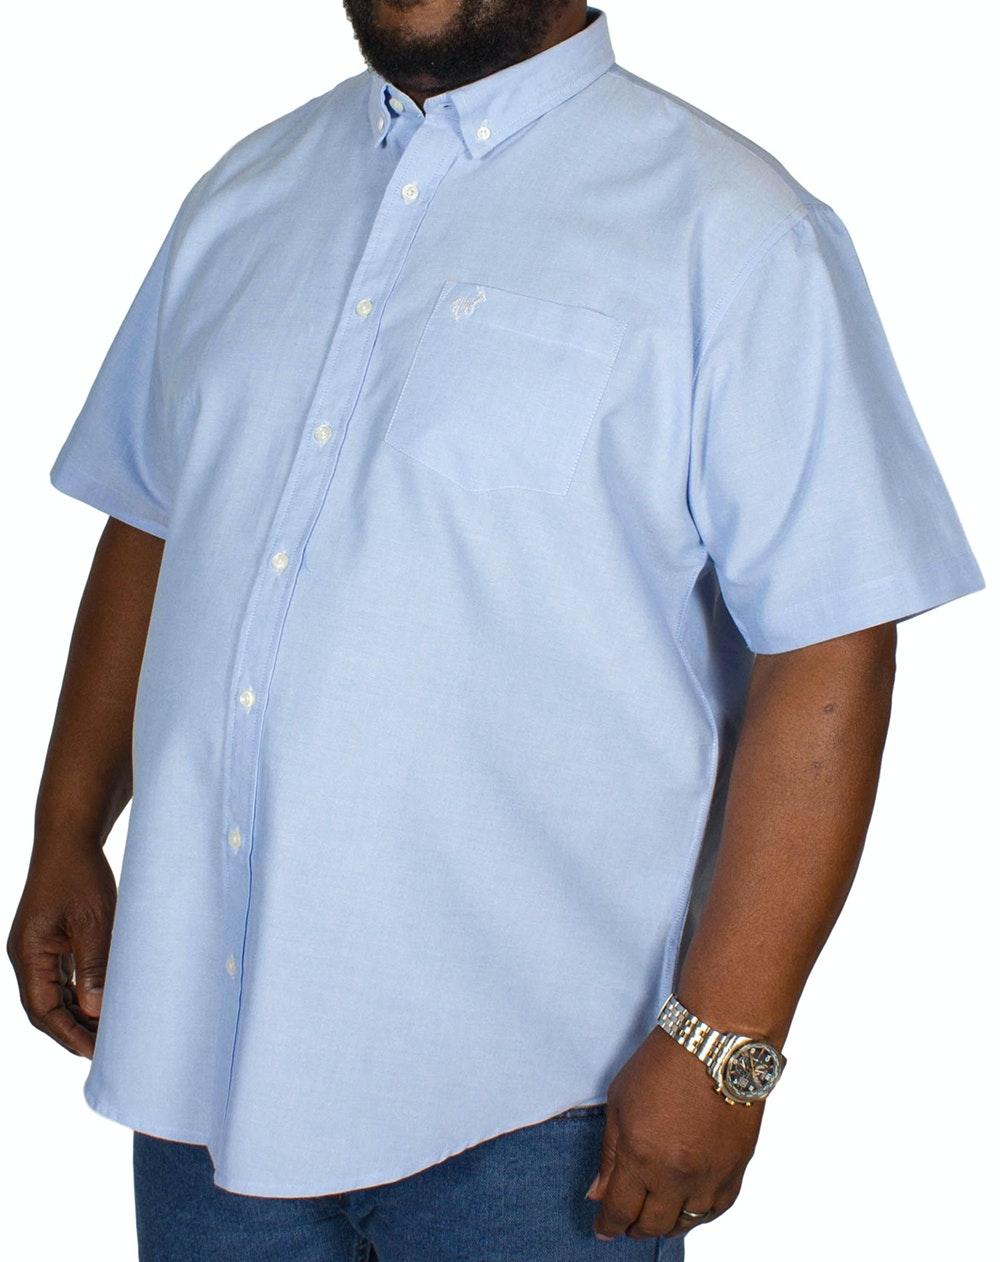 Bigdude Short Sleeve Oxford Shirt Blue